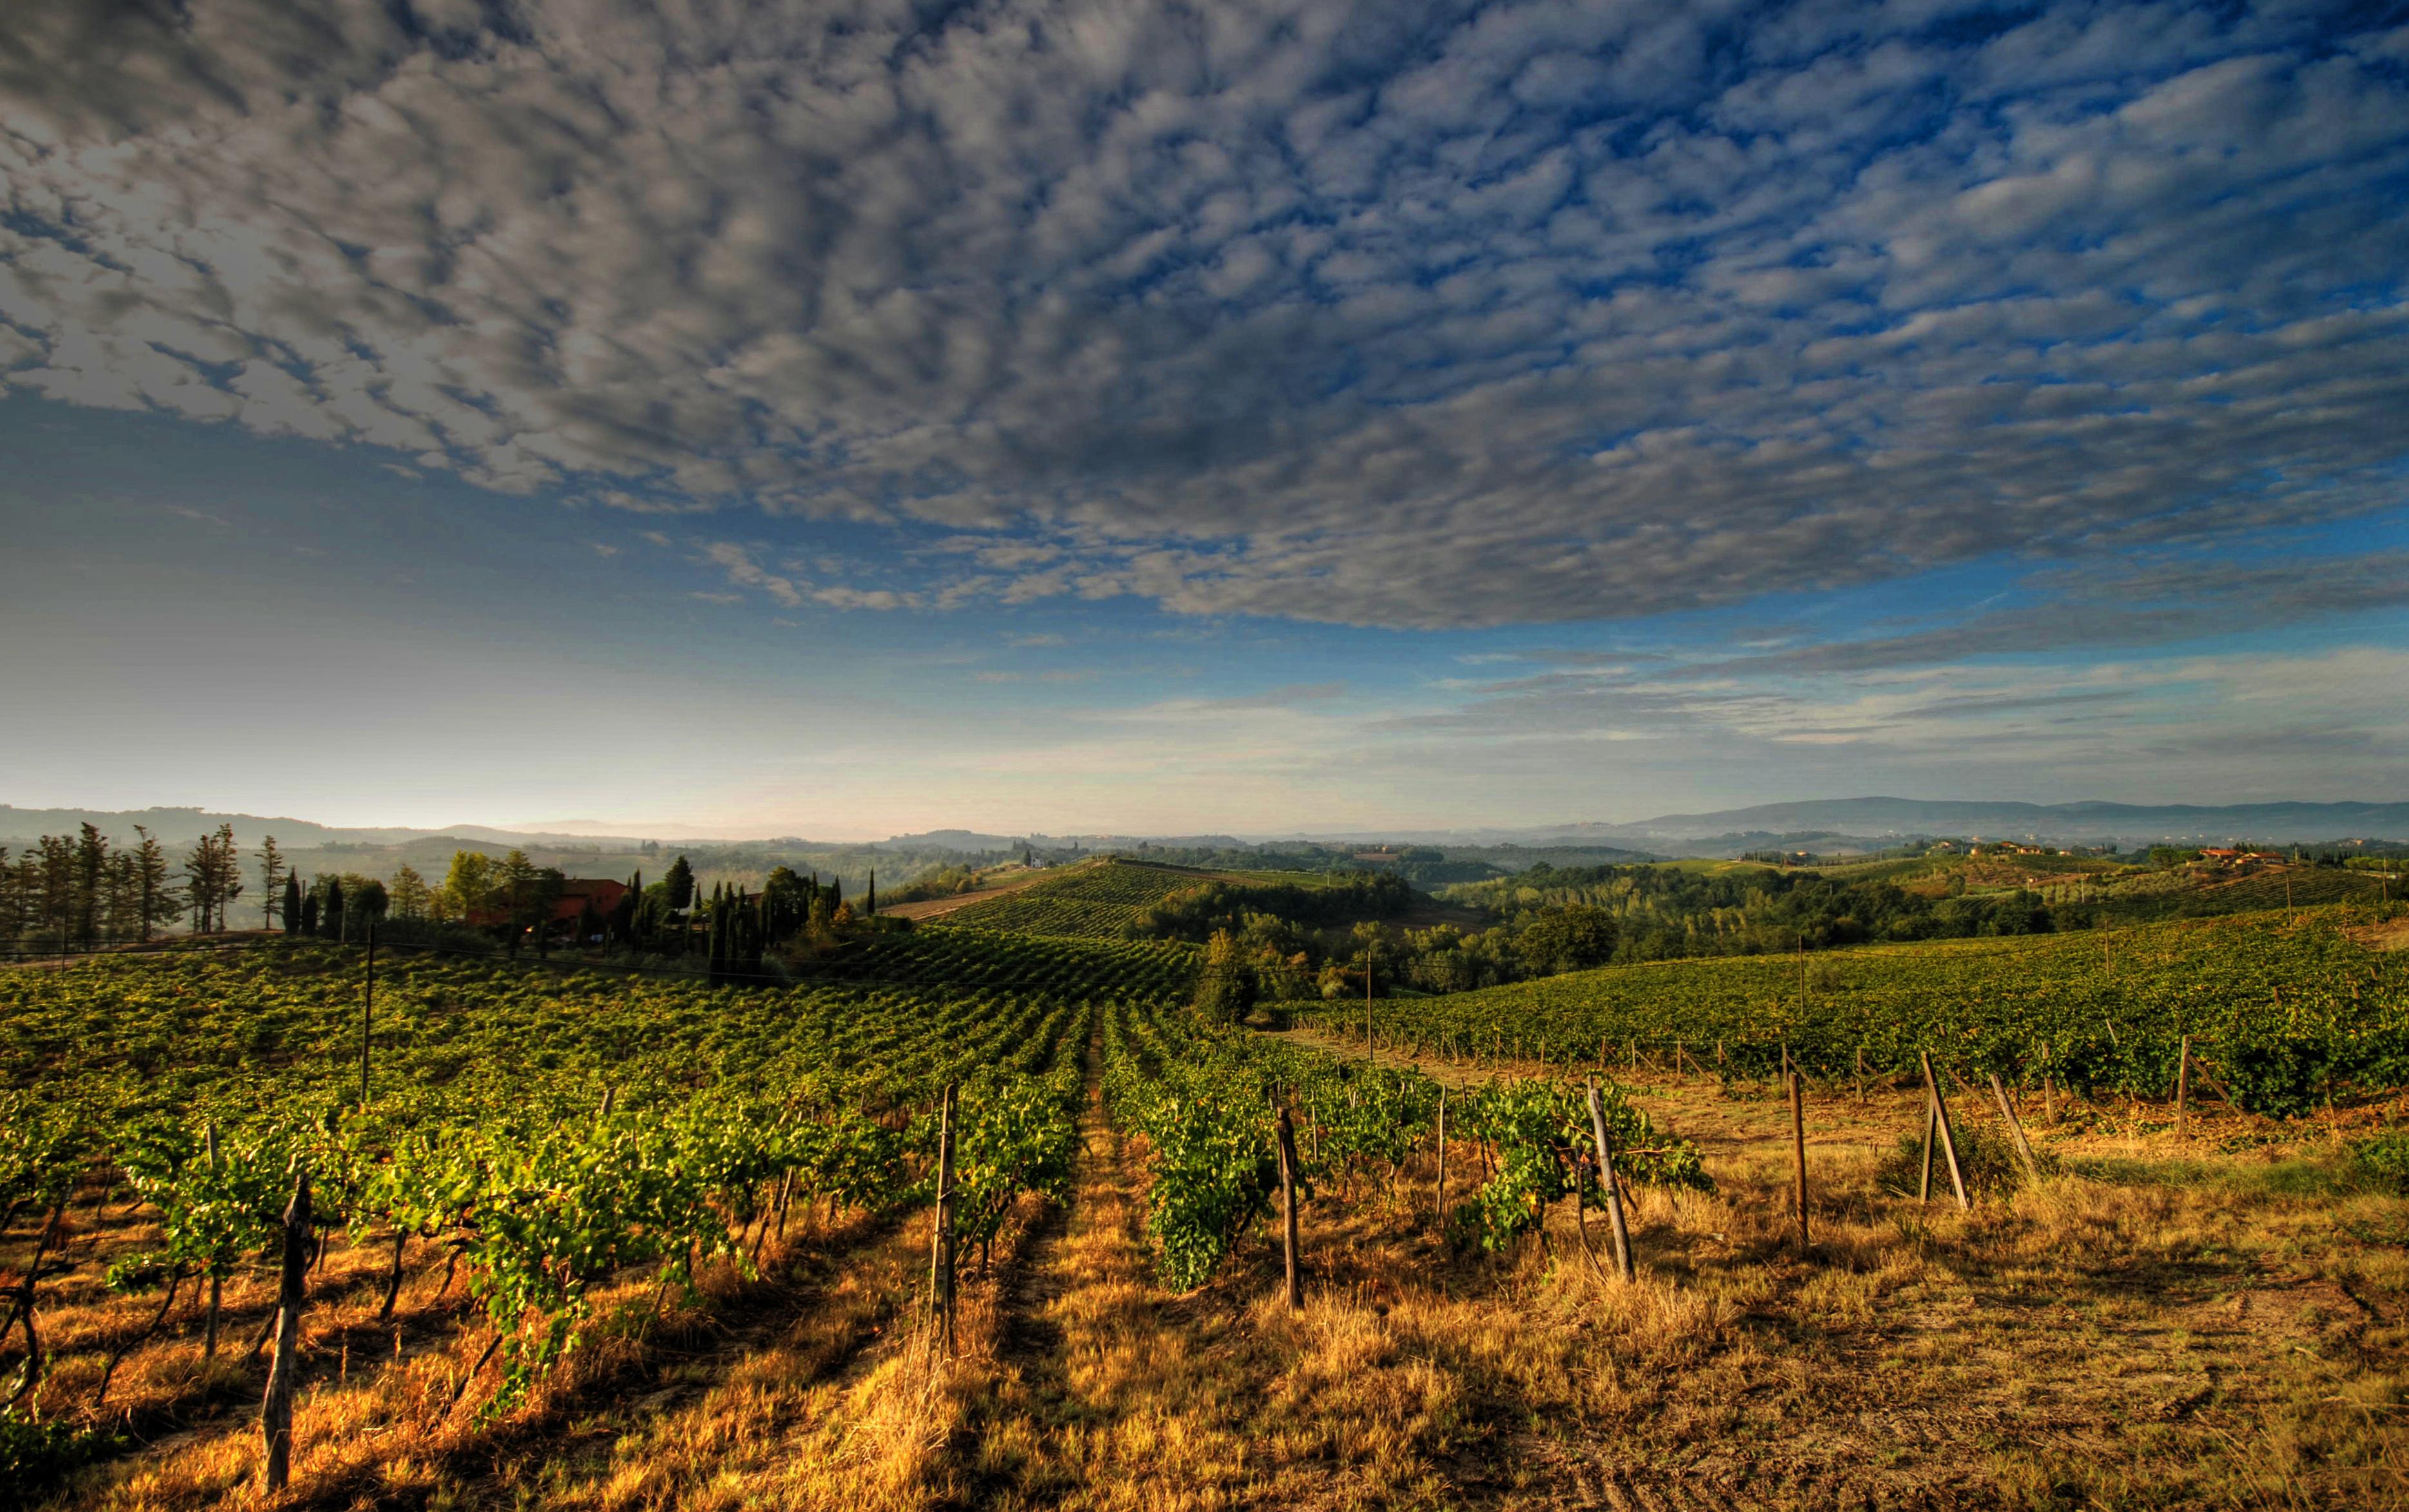 Agricoltura biologica e regolamentazione europea